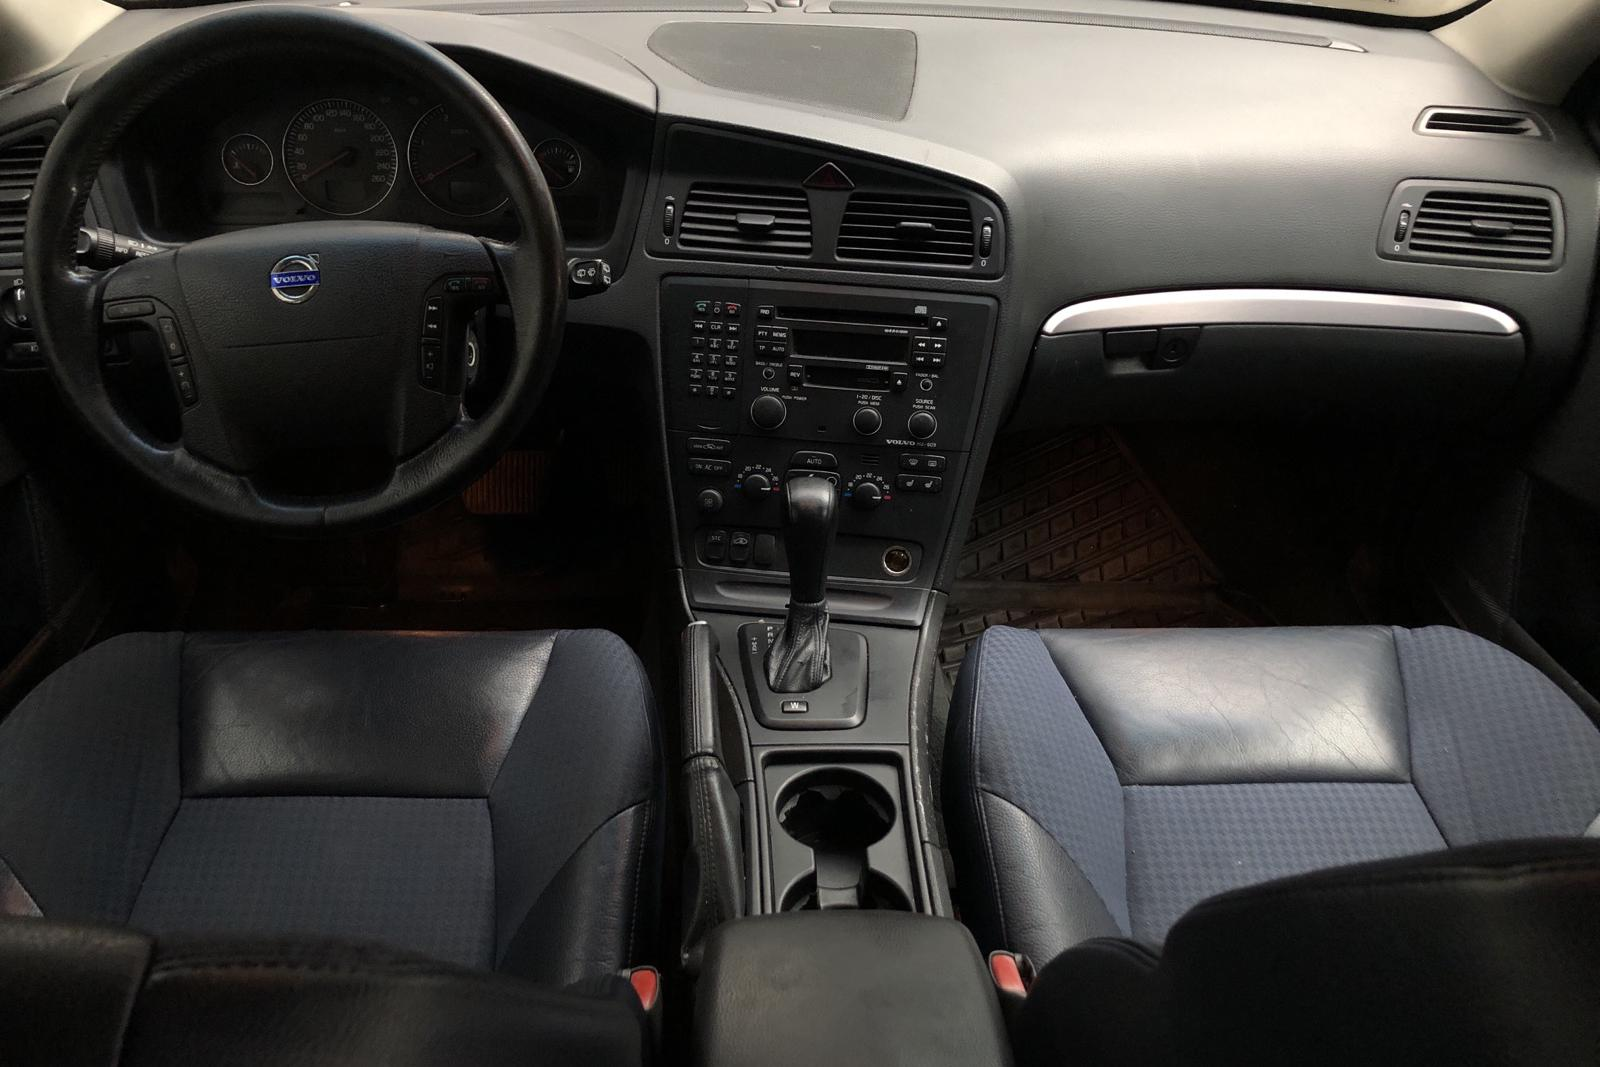 Volvo V70 2.4D (163hk) - 392 540 km - Automatic - Dark Blue - 2004